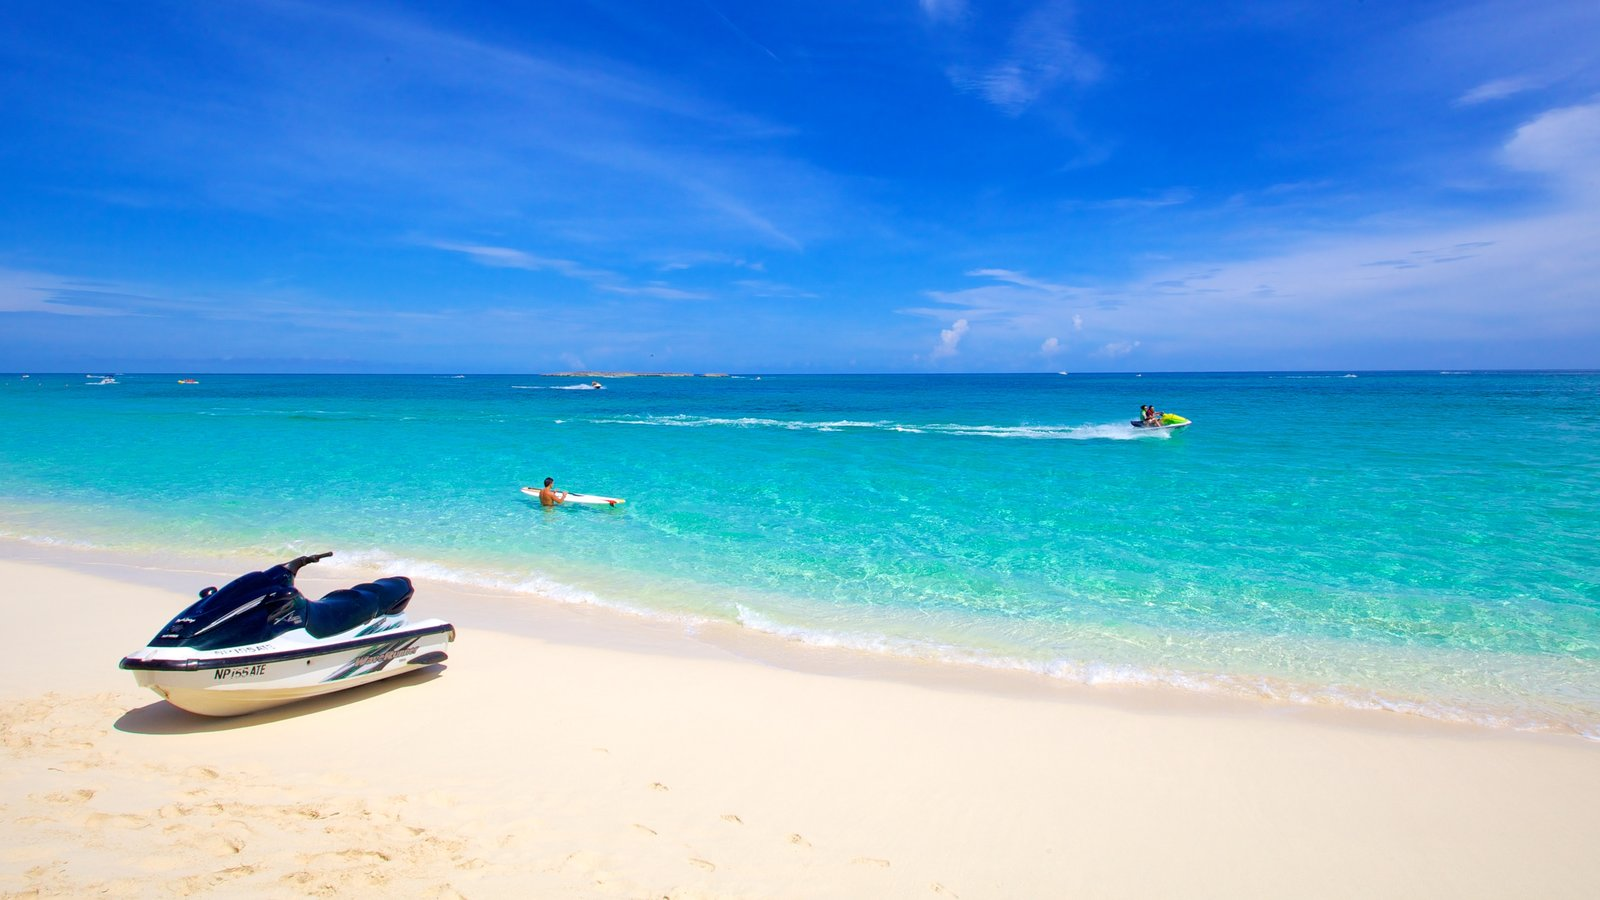 Landscape Pictures View Images Of Nassau